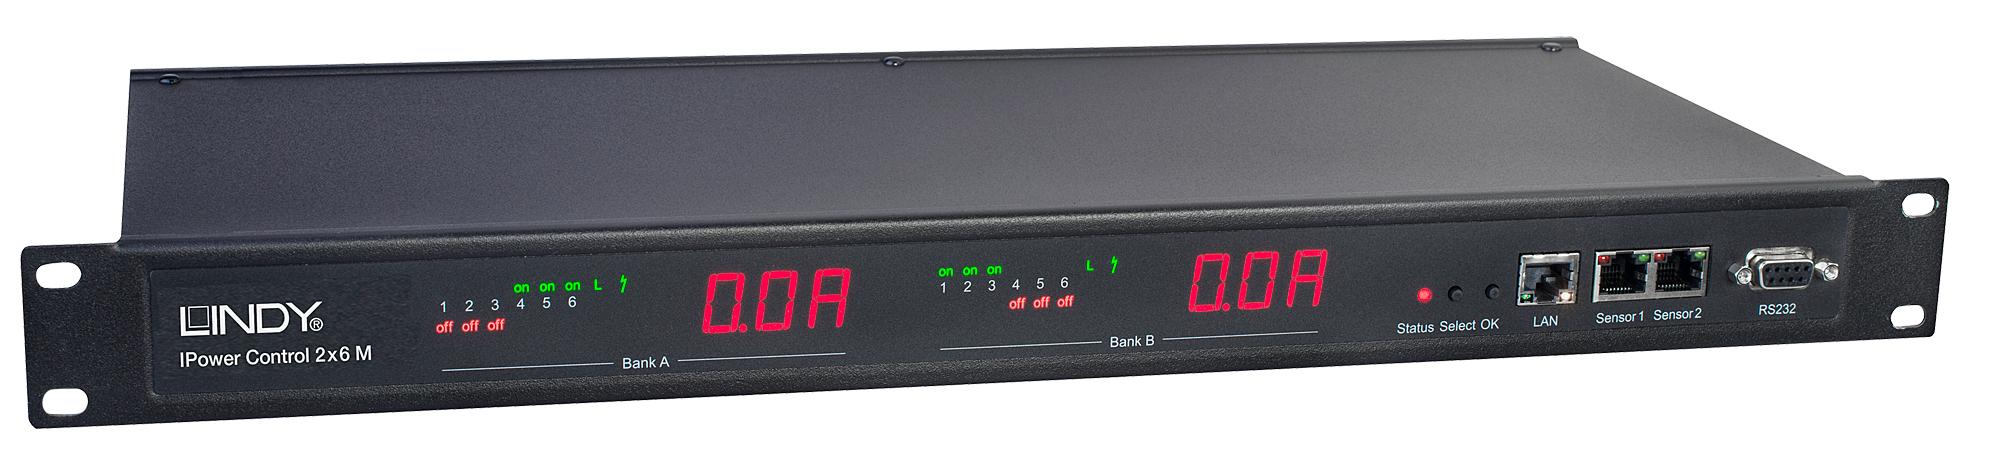 Lindy IPowerControl 2x6 M - Power Control Unit ( Rack-montierbar ) - Wechselstrom 230 V